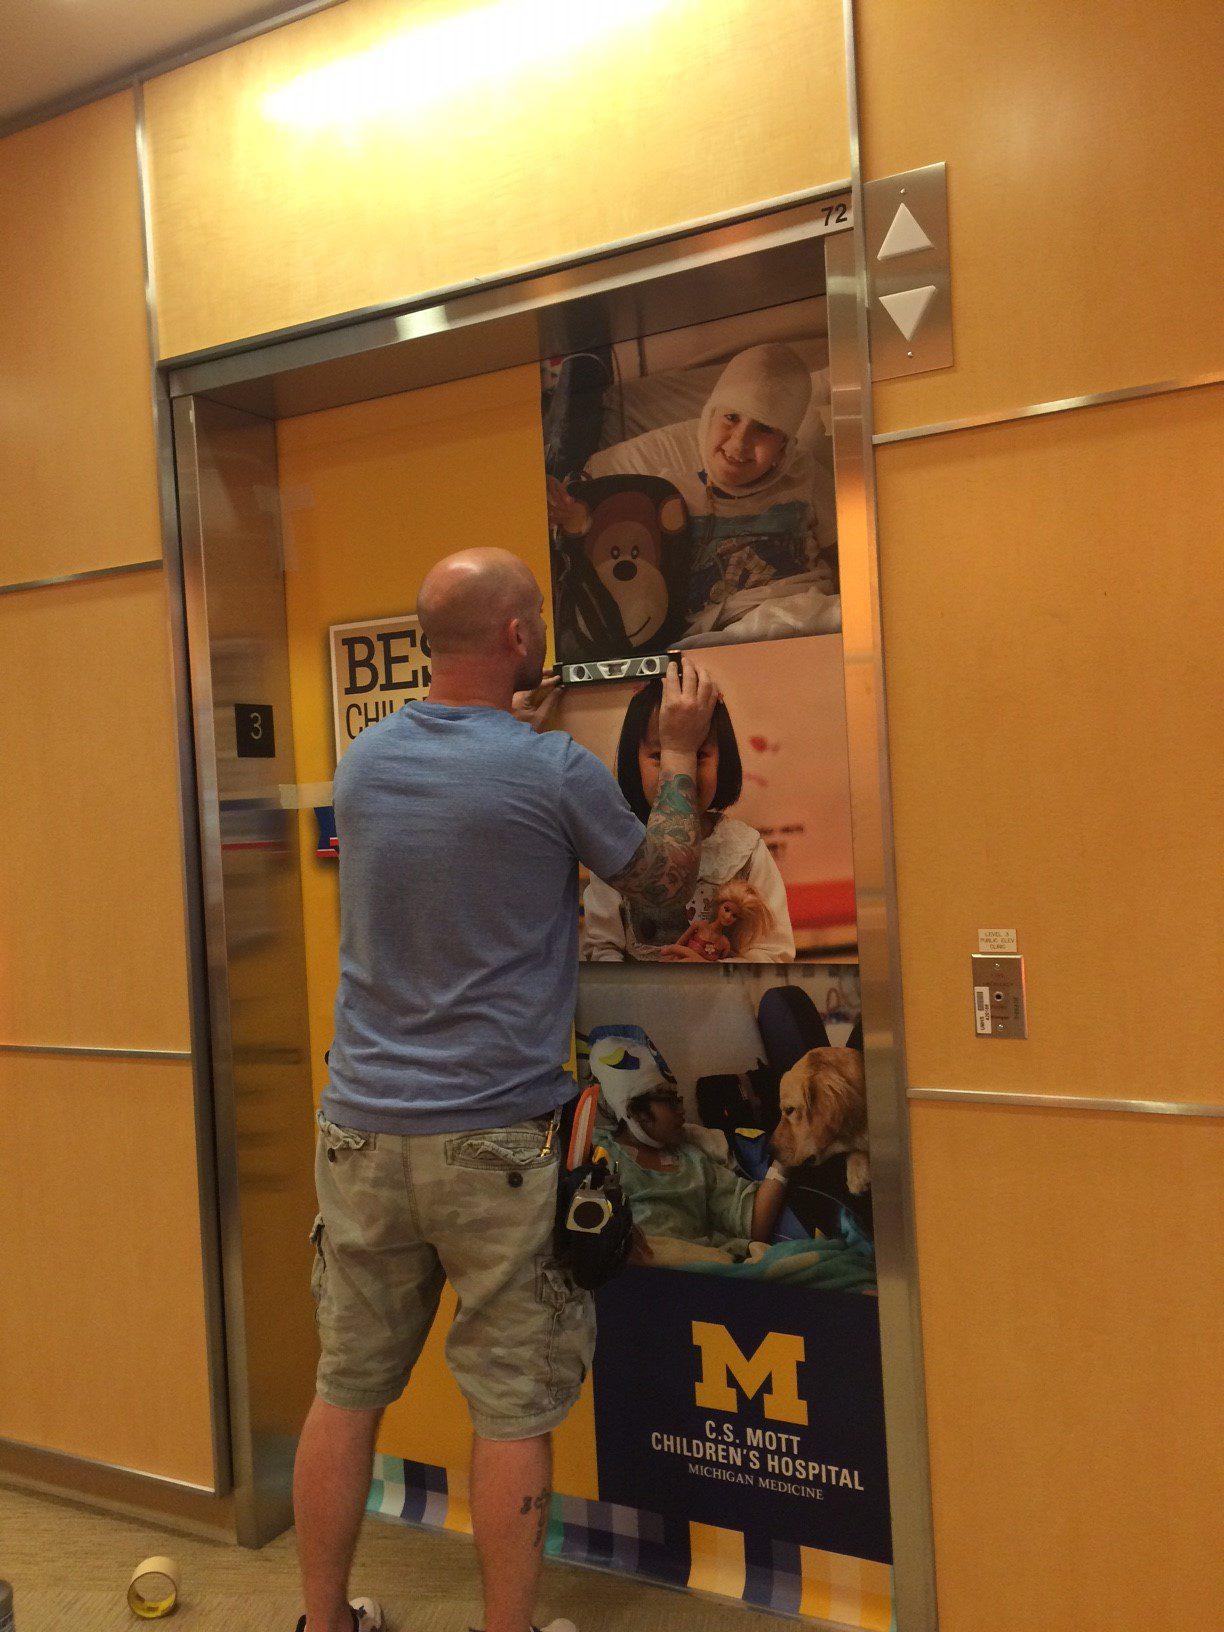 CS Mott Childrens Hospital Elevators - 01